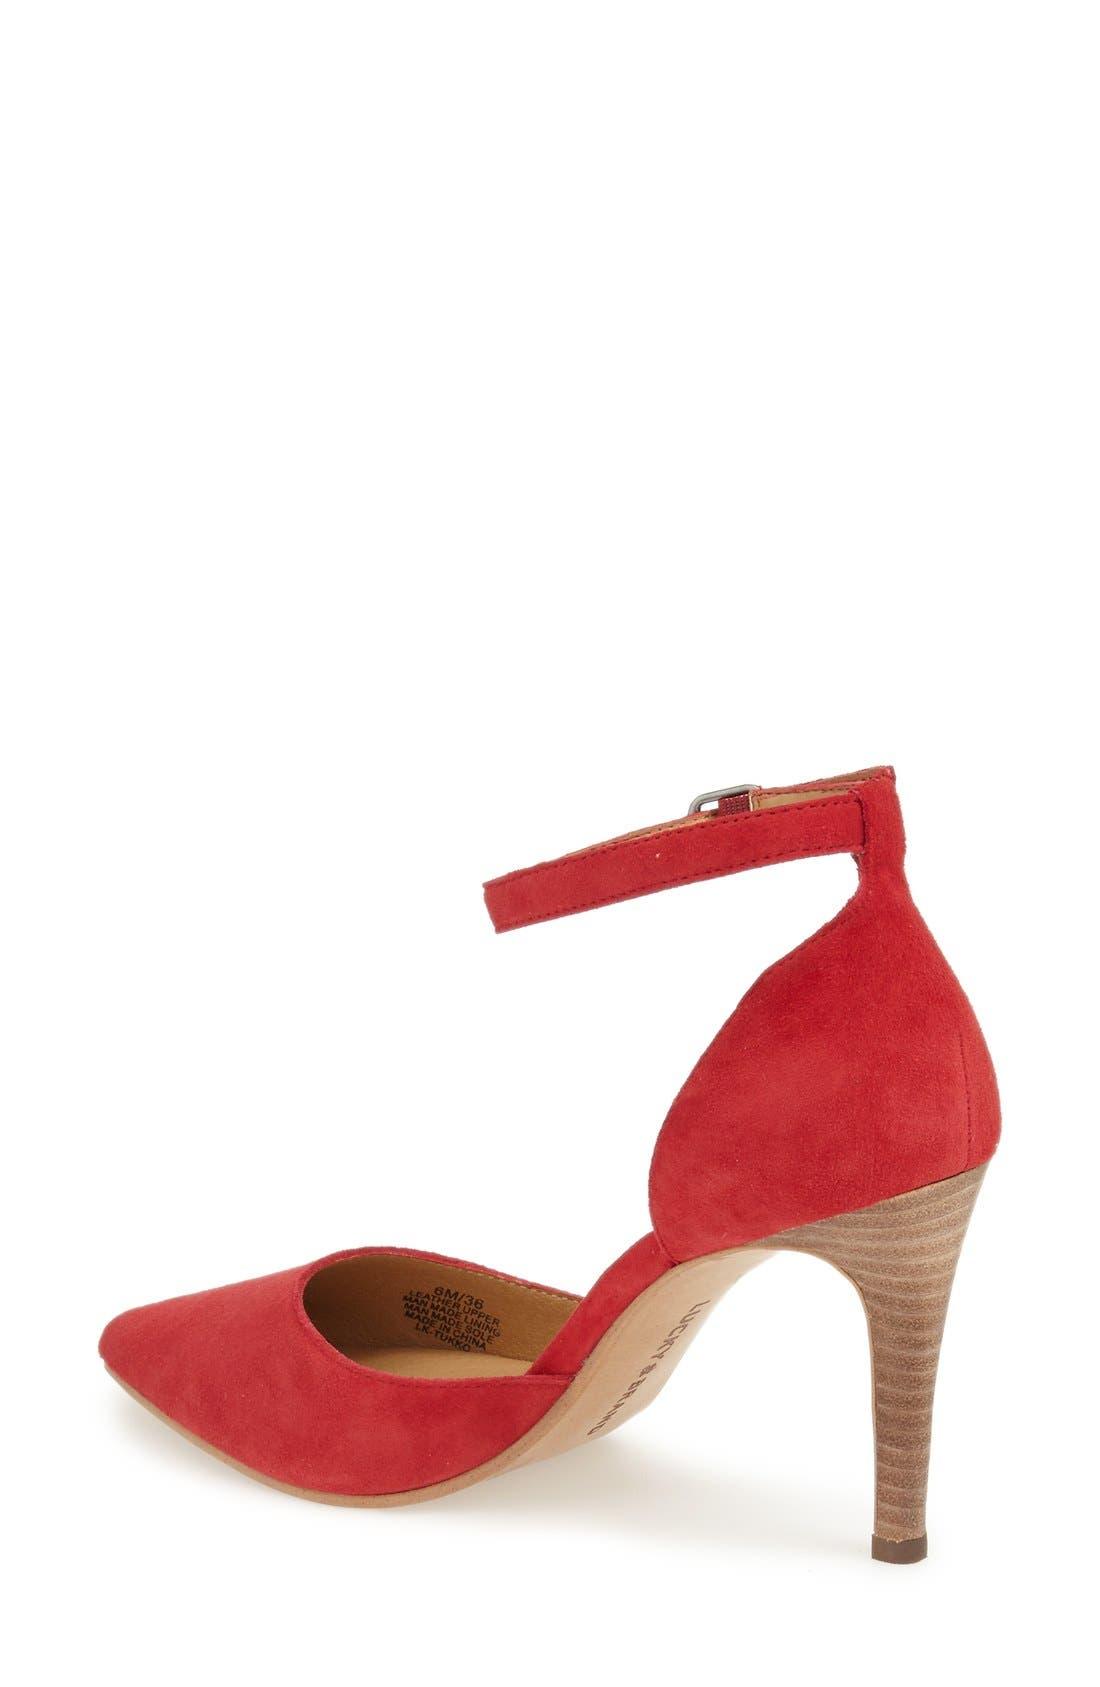 Alternate Image 2  - Lucky Brand 'Tukko' d'Orsay Ankle Strap Pump (Women)